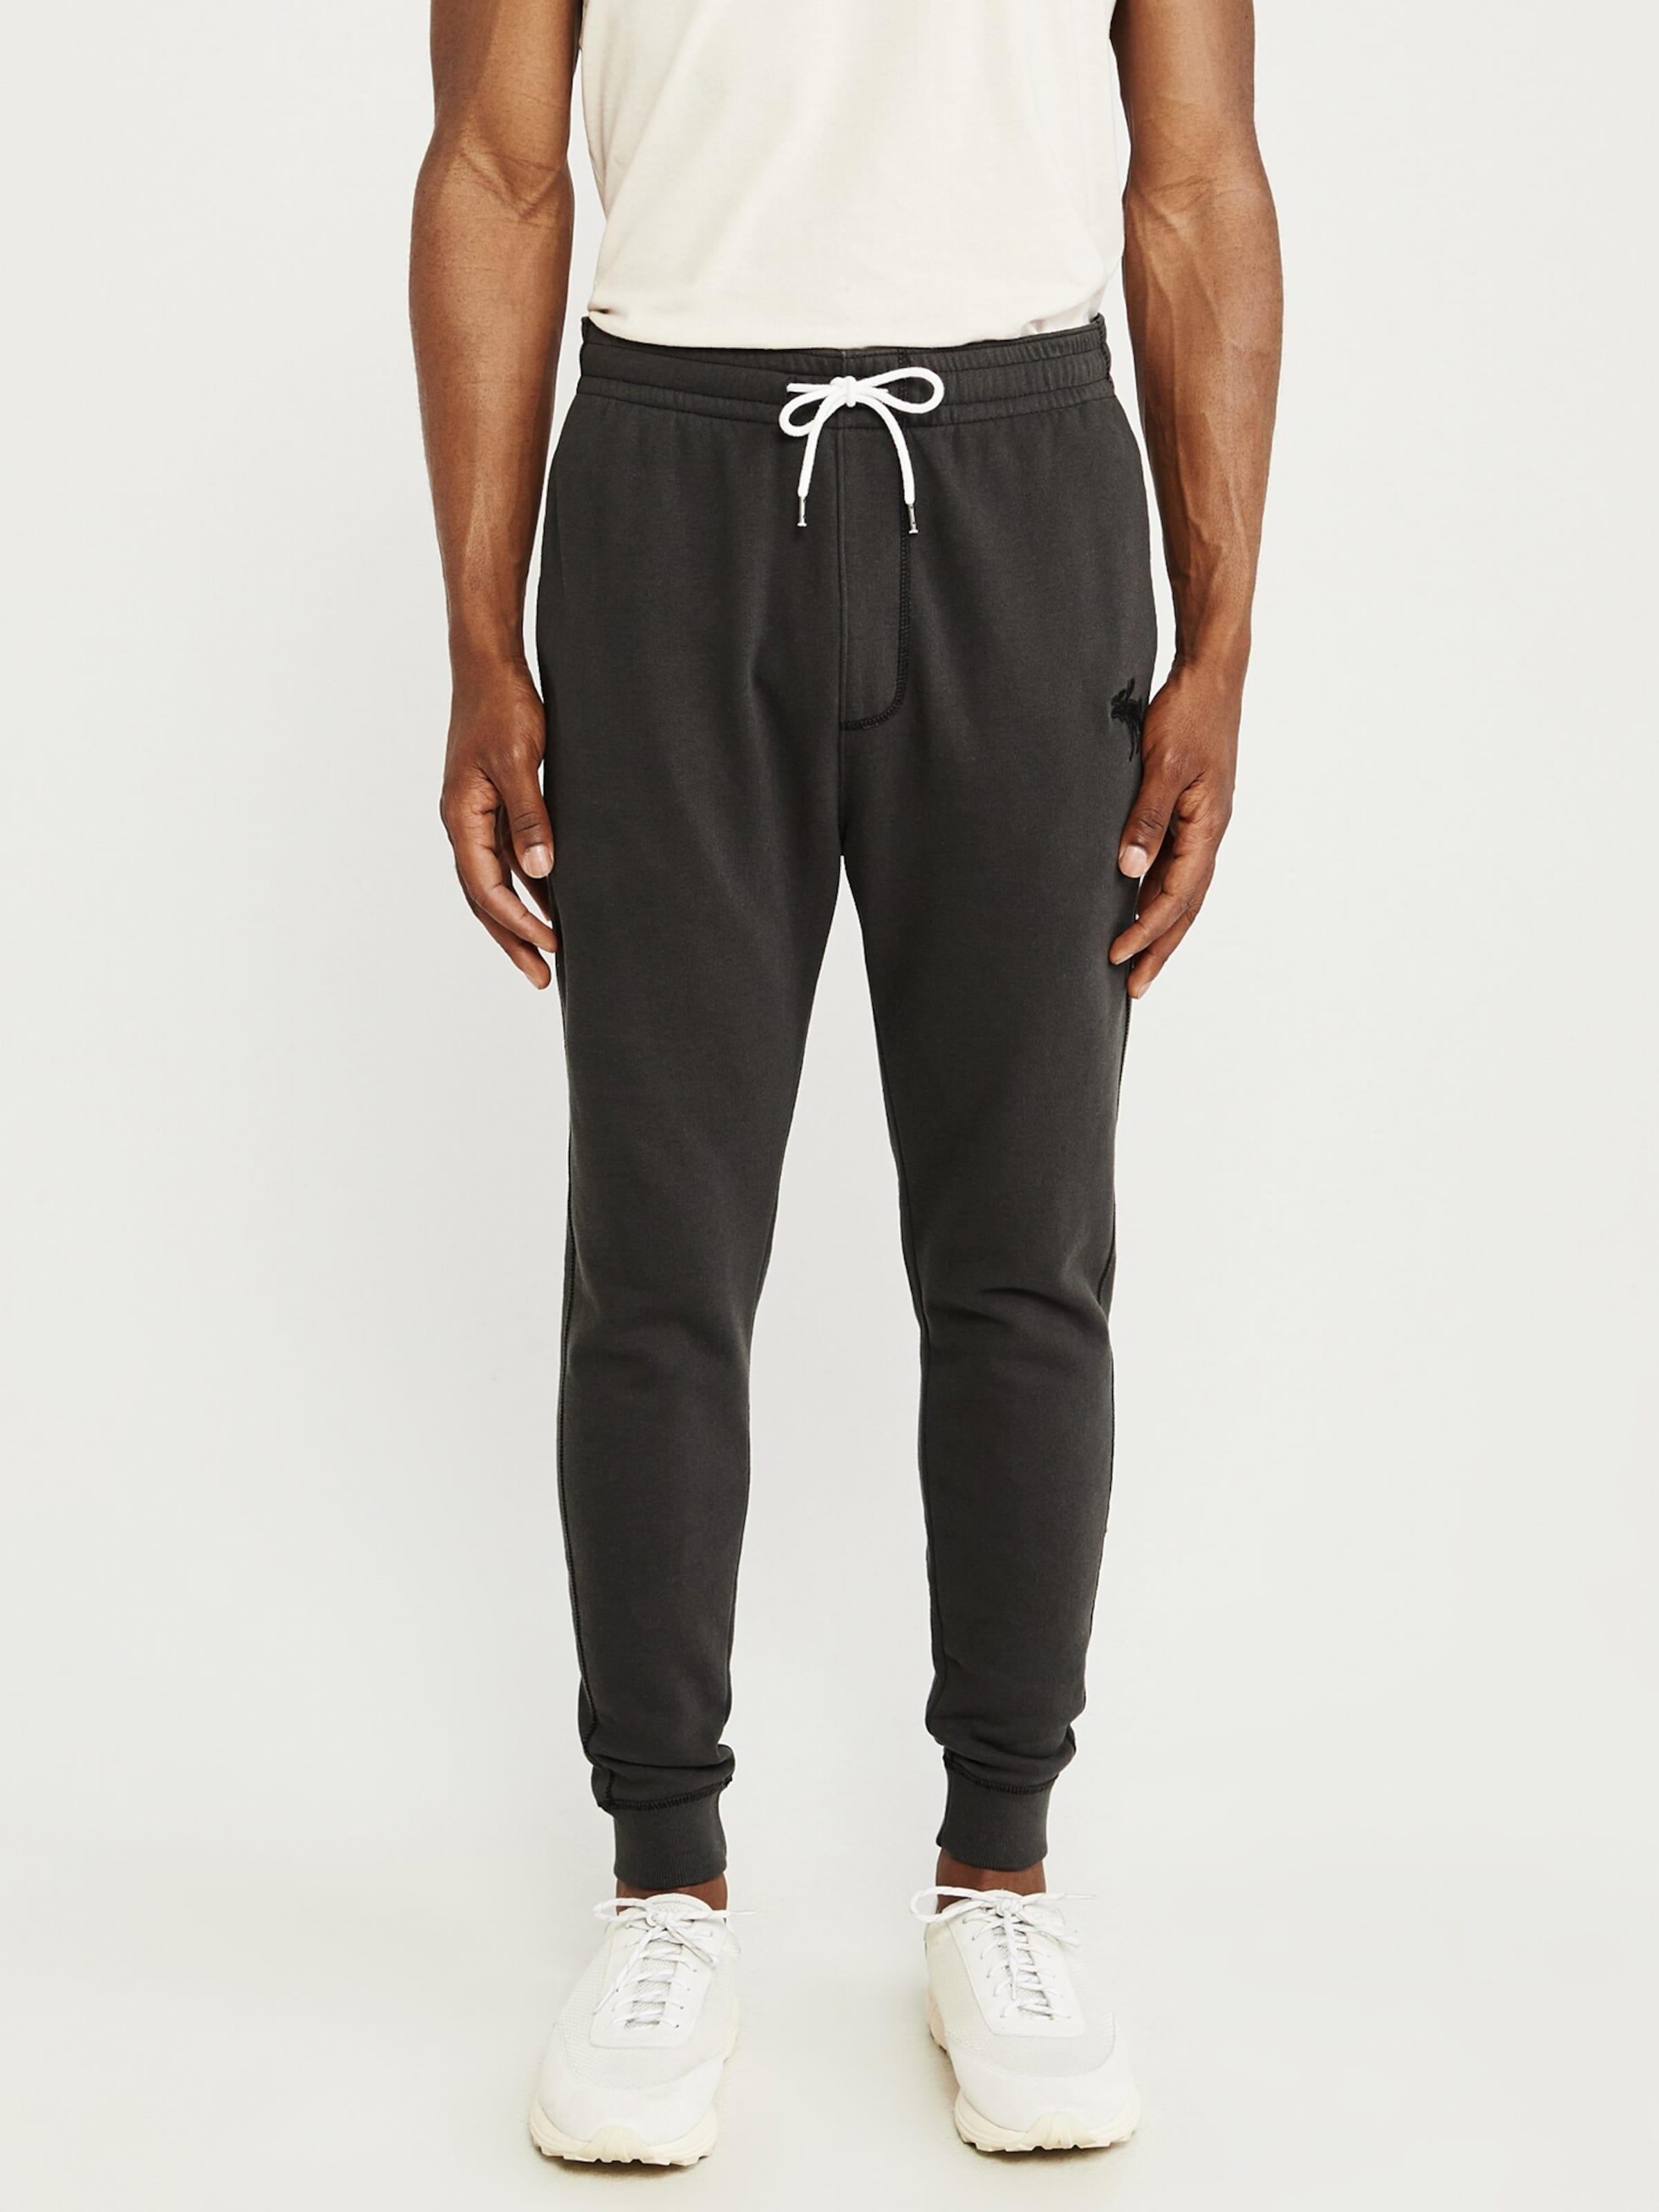 Pantalon Pantalon Fitch Abercrombieamp; Abercrombieamp; En Fitch Fitch Abercrombieamp; Noir En Noir ukiPXZ